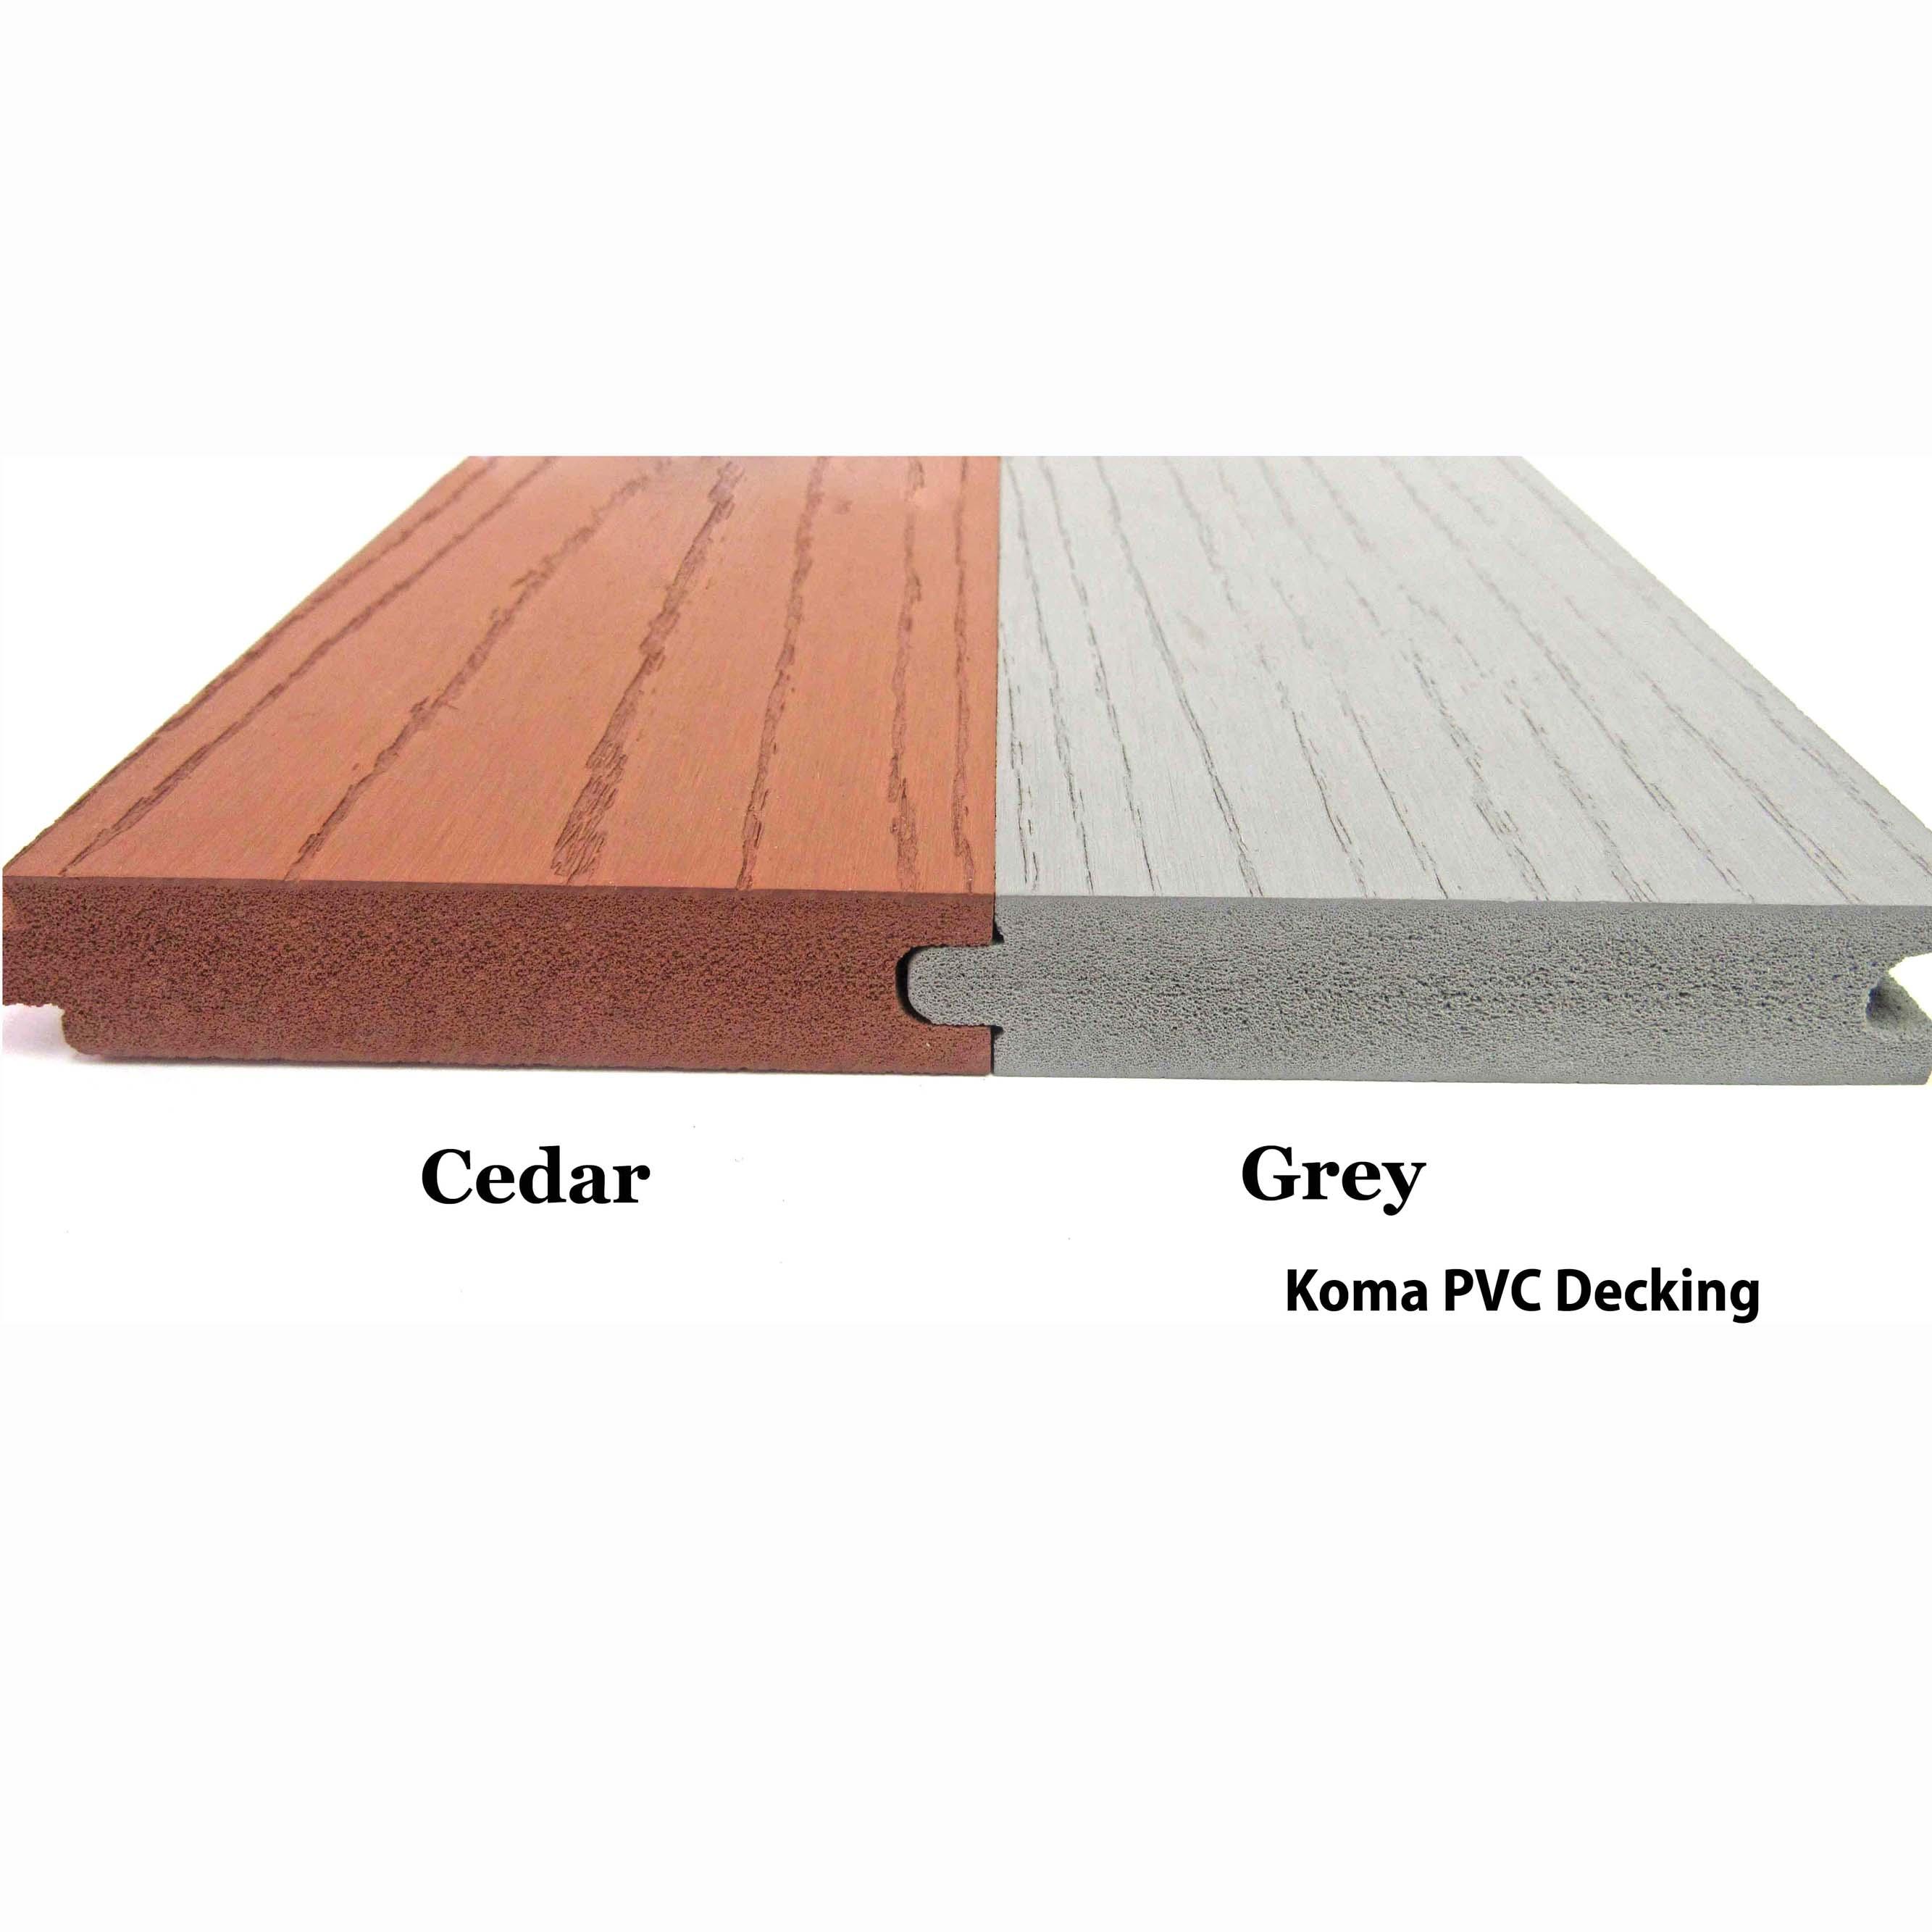 porch x common at flooring shop decking aeratis ft porches com lowes in building floor pl supplies